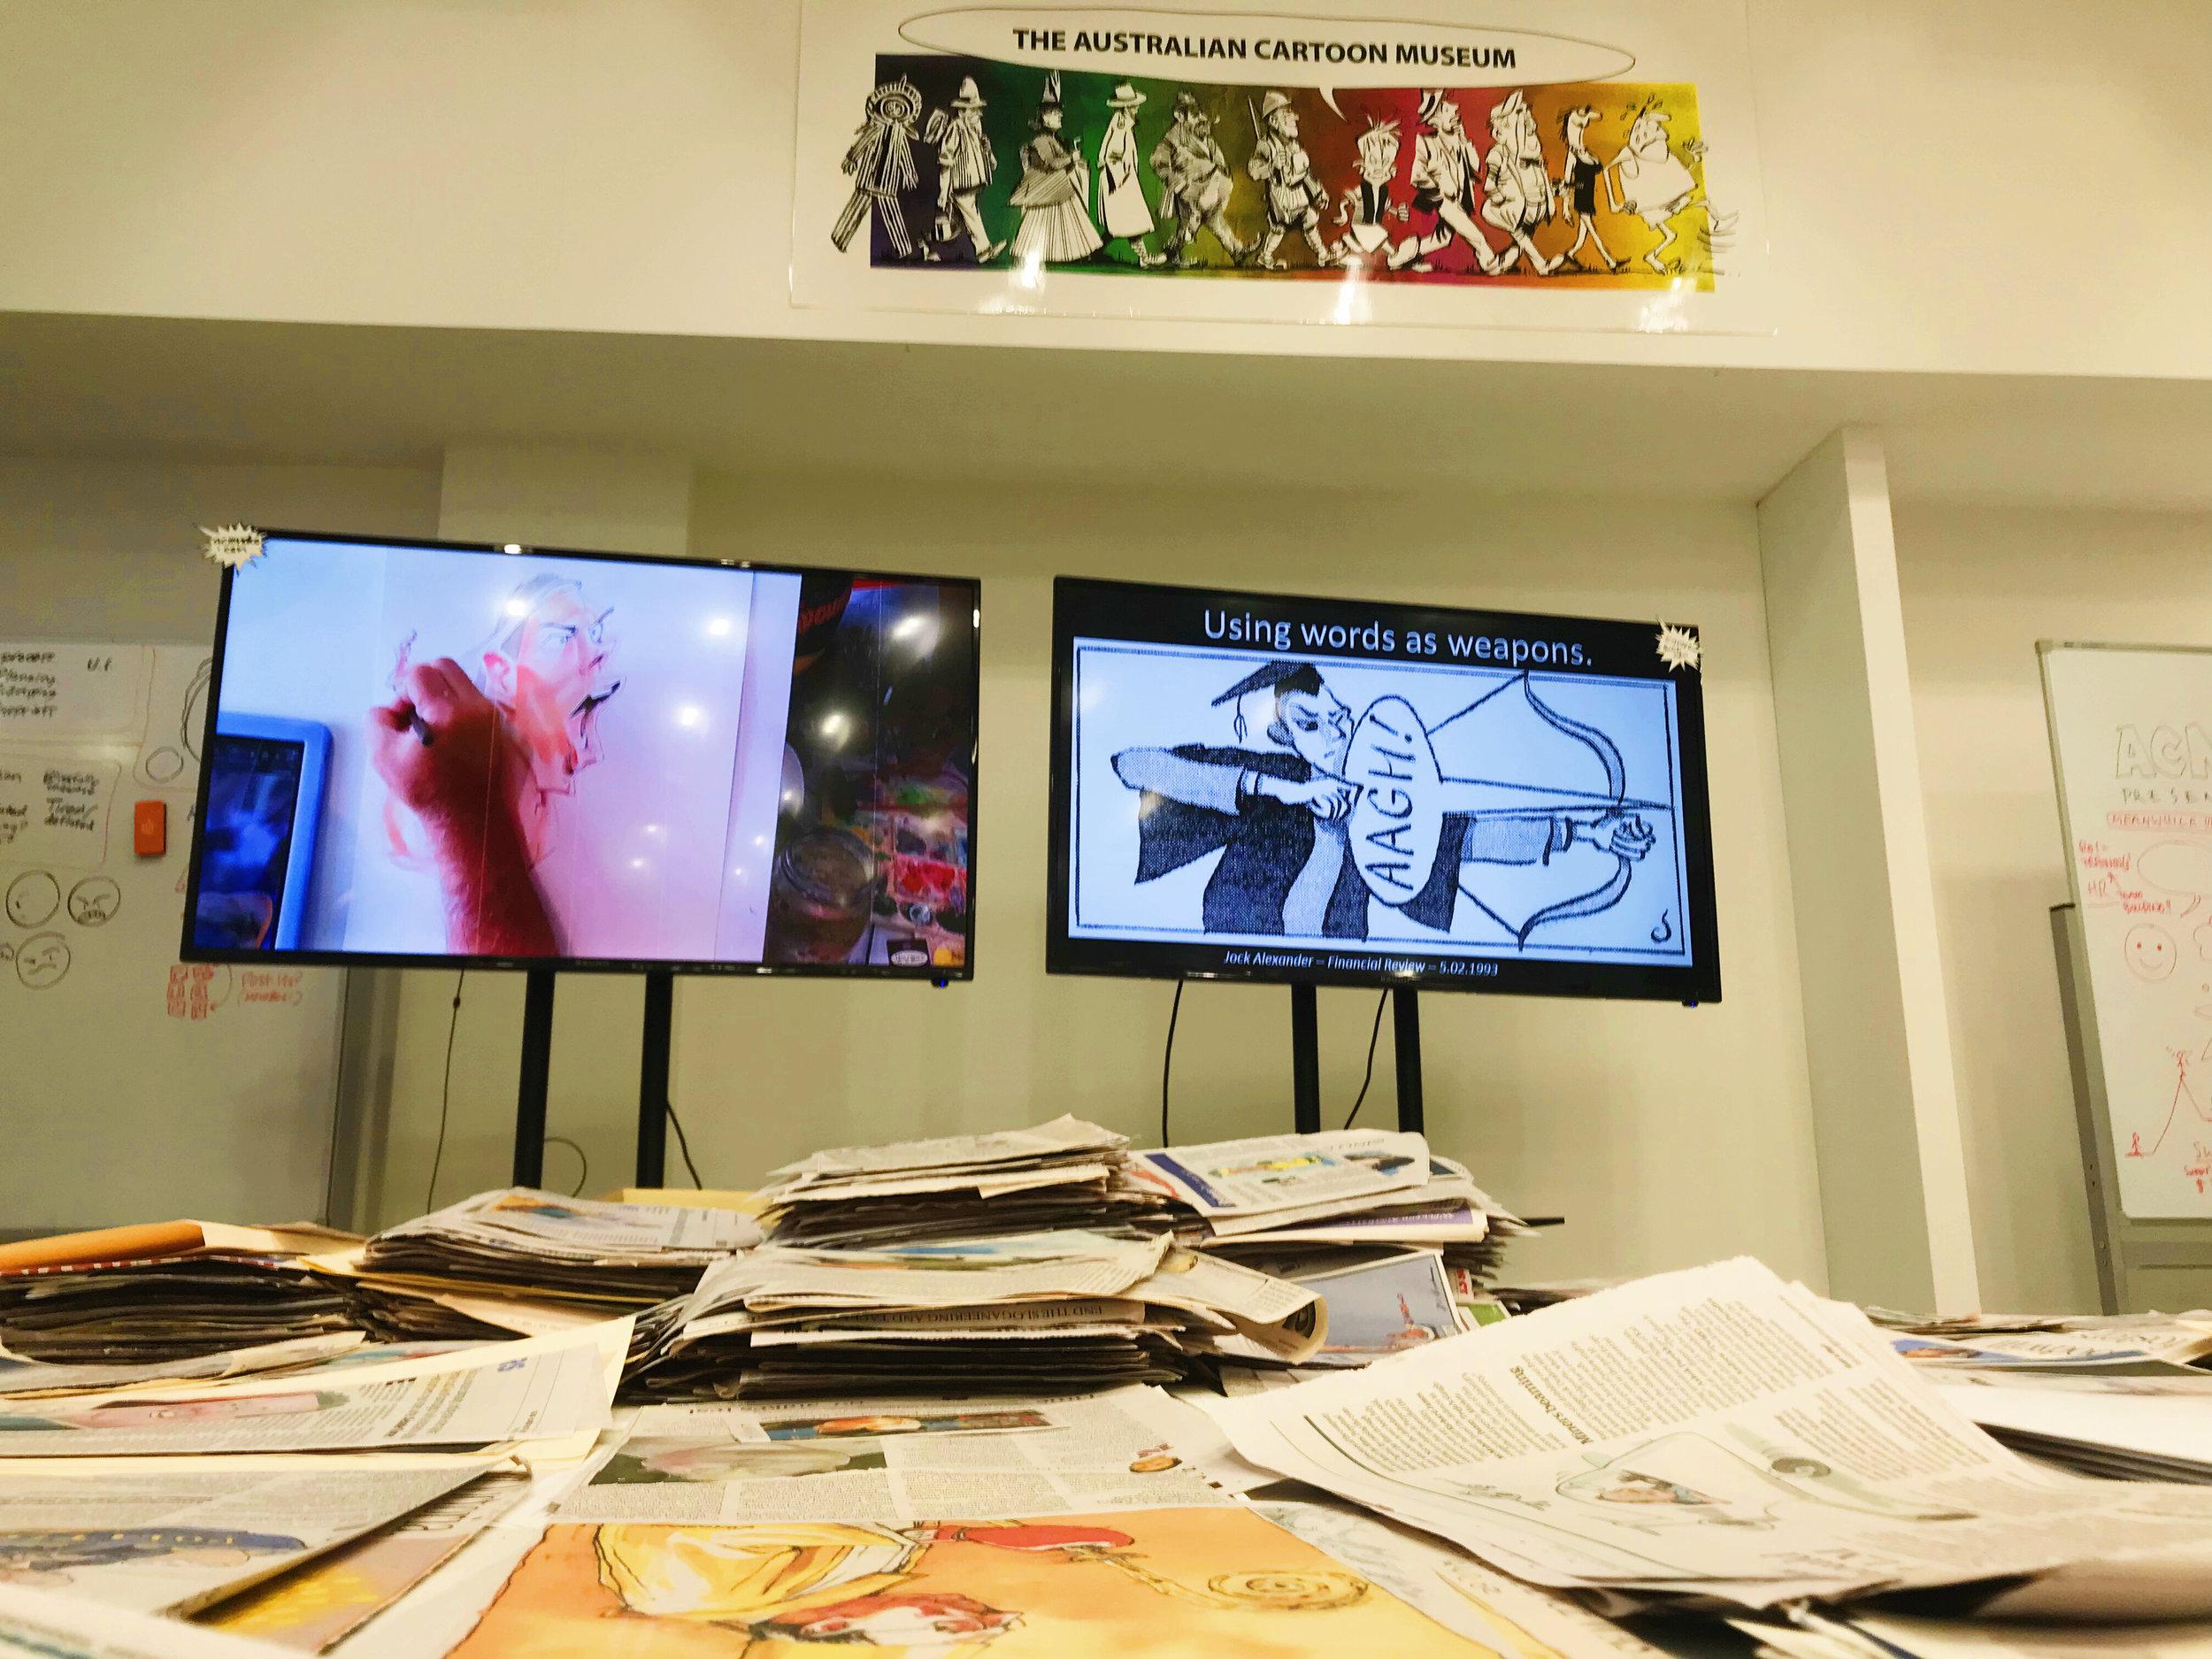 Jim Bridges之所以对漫画情有独钟,除了童年的幻想,还来源于漫画的特殊意义。